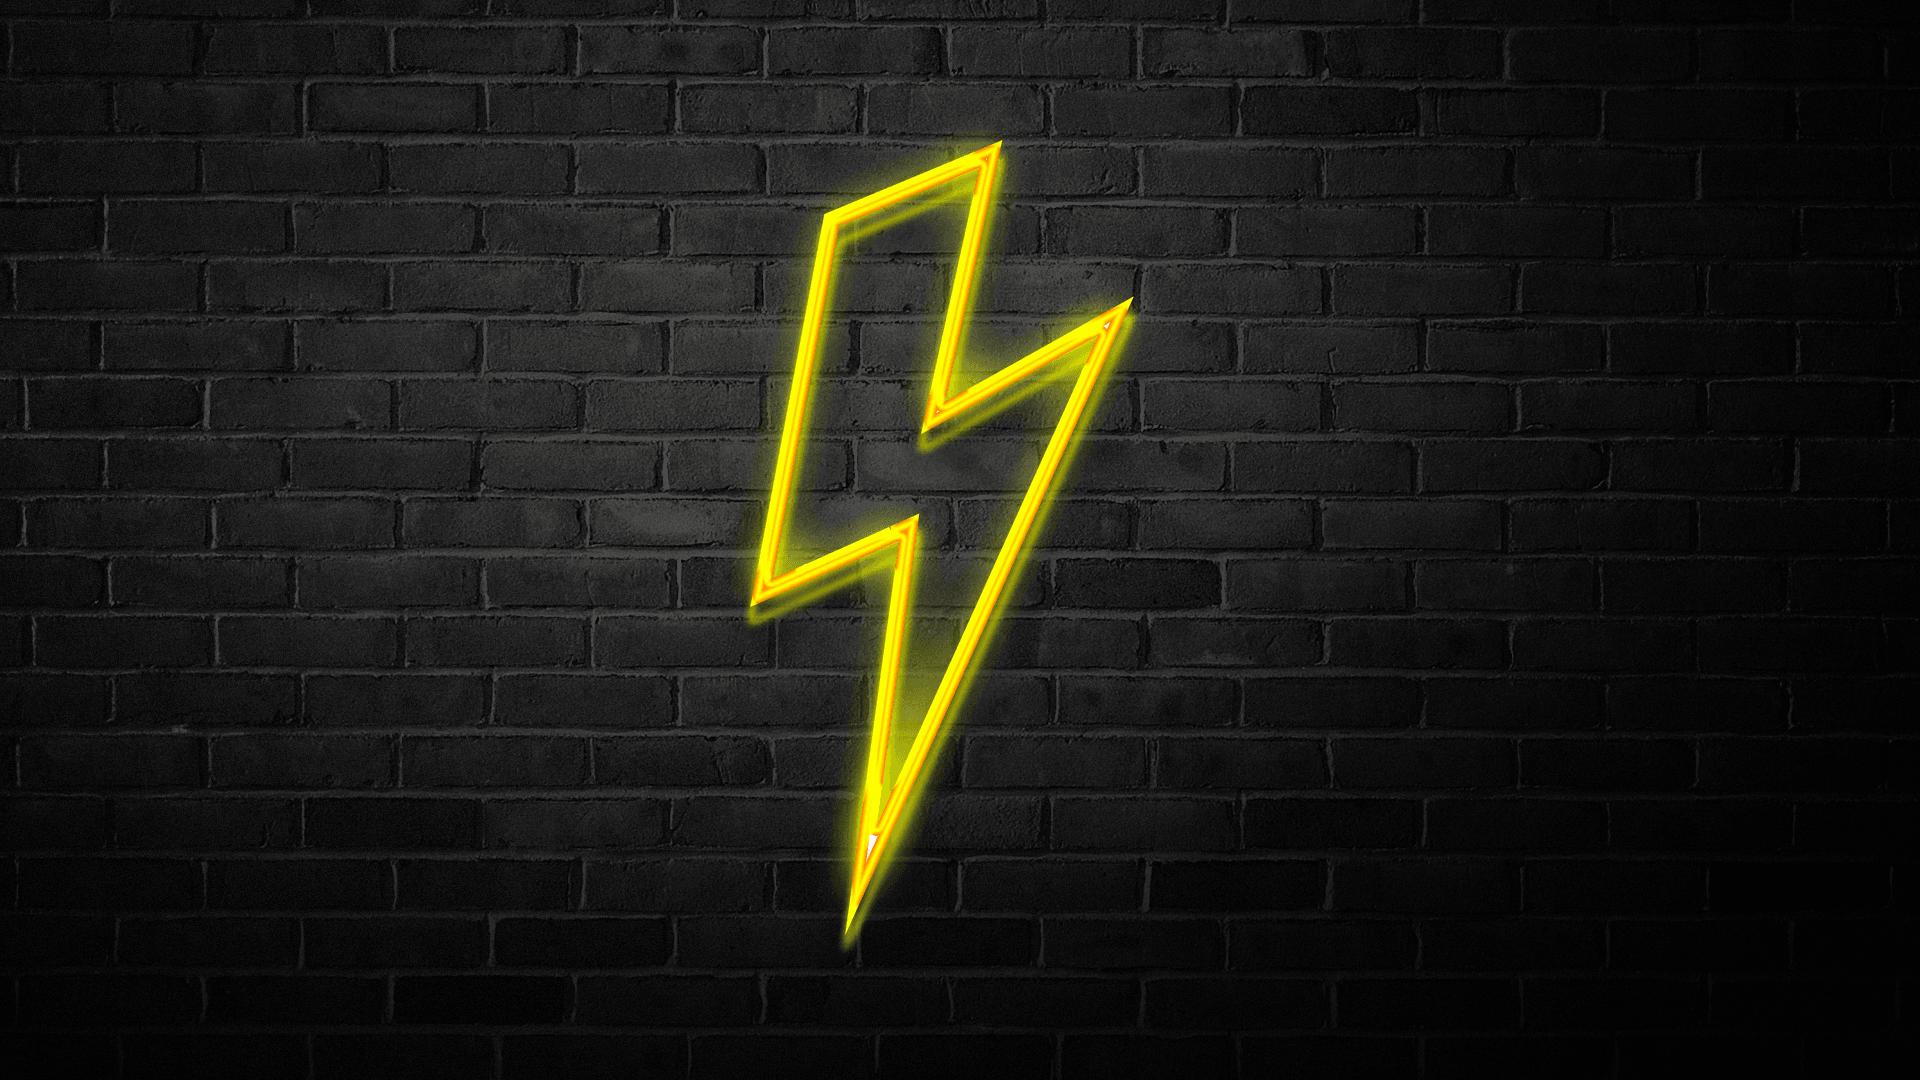 neon-sign_spin-it_yoenpaperland